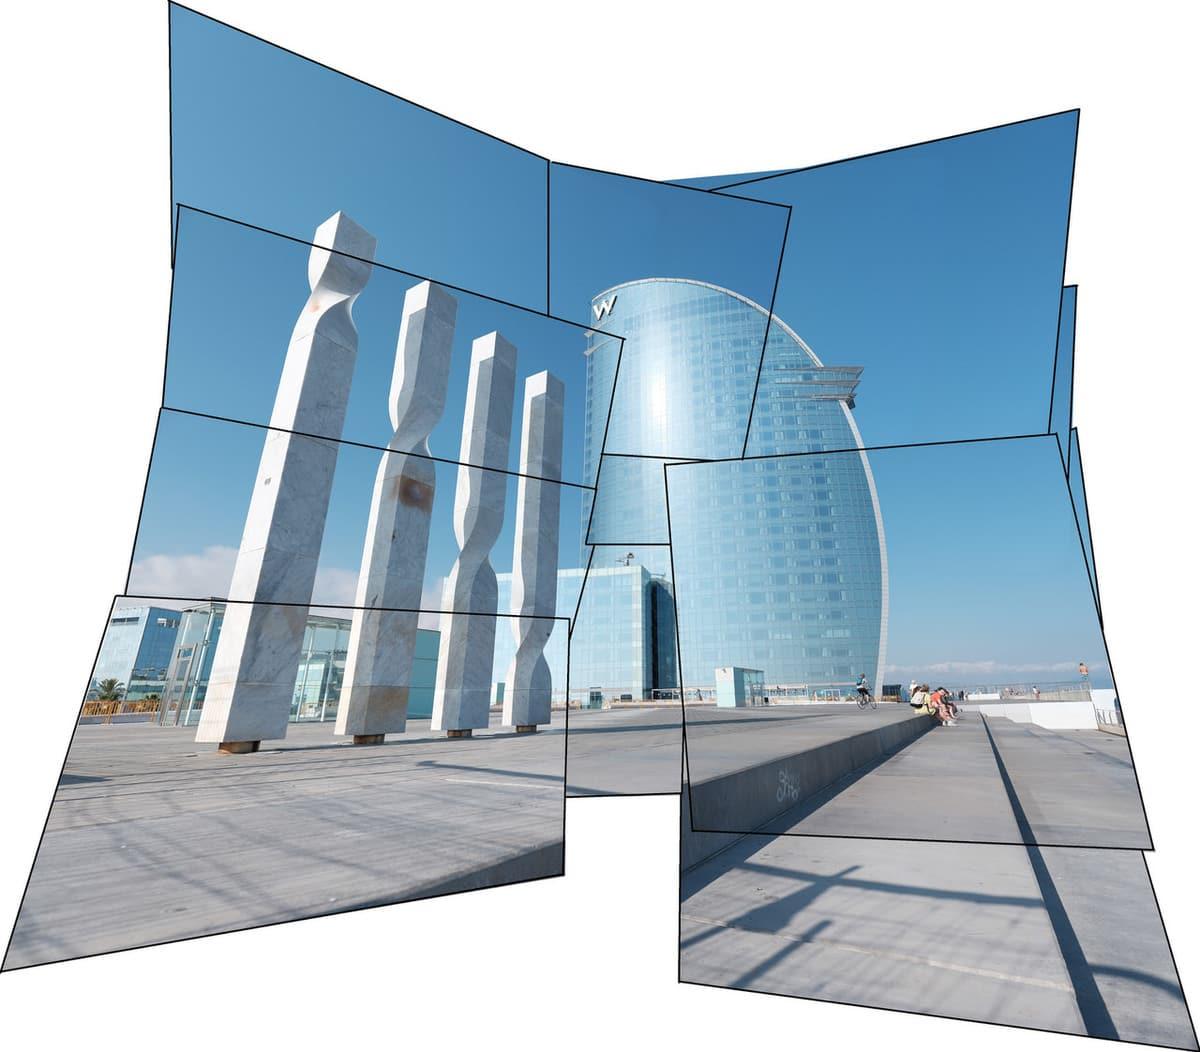 """Hotel W Barcelona (Hotel Vela)"" por Jaime Viñas. Fuji X-T1 + XF 35mm F2 R WR."